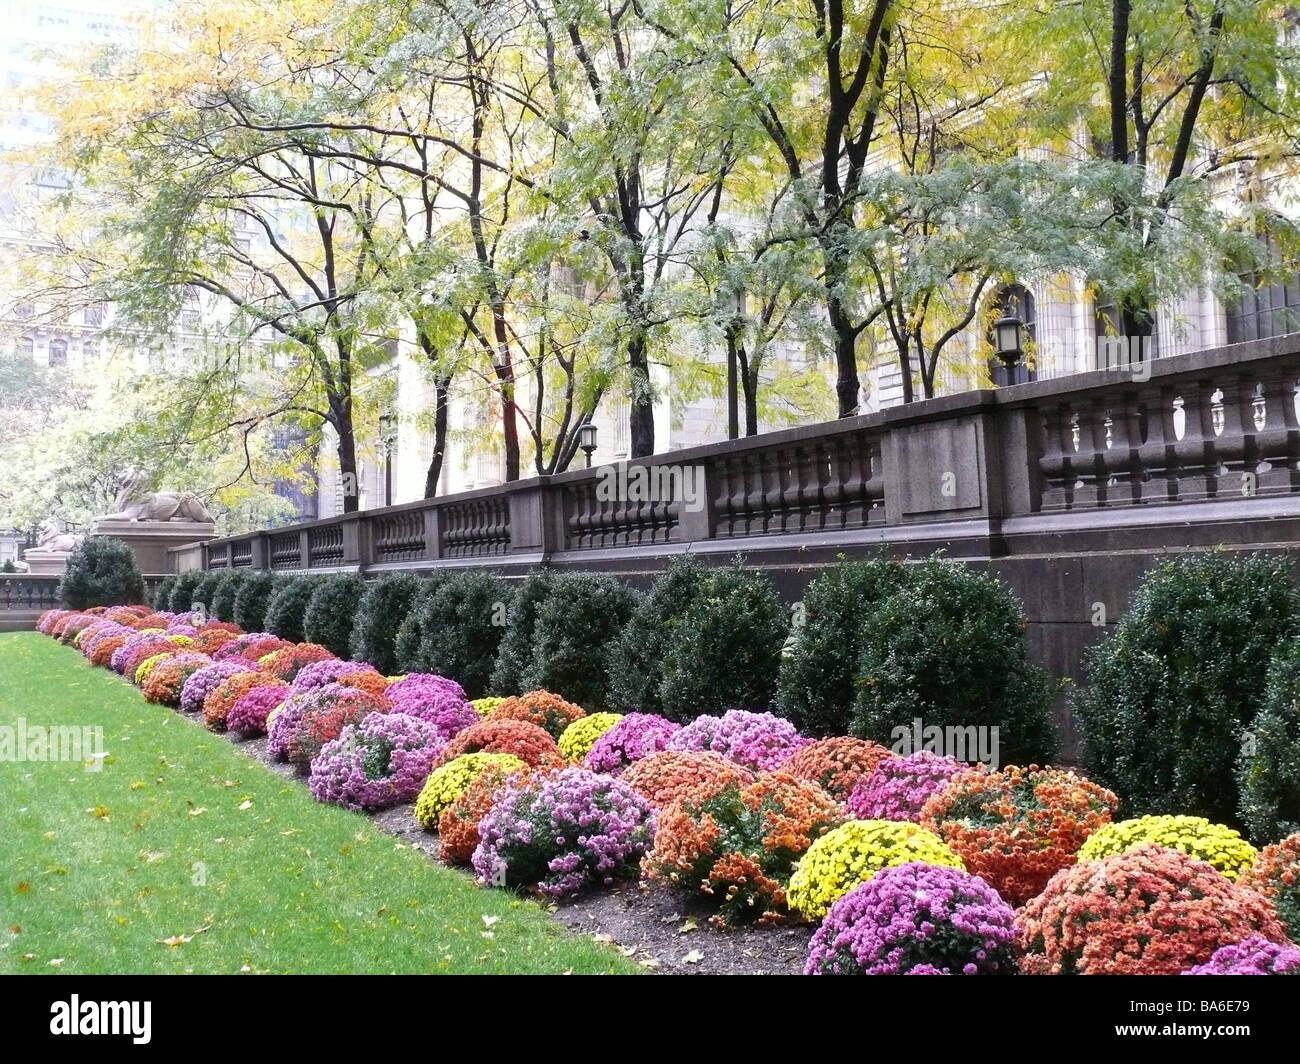 USA New York City New York Public Library Outside Garden Flower Beds  America City Manhattan Buildings Facade Detail Wall Garden